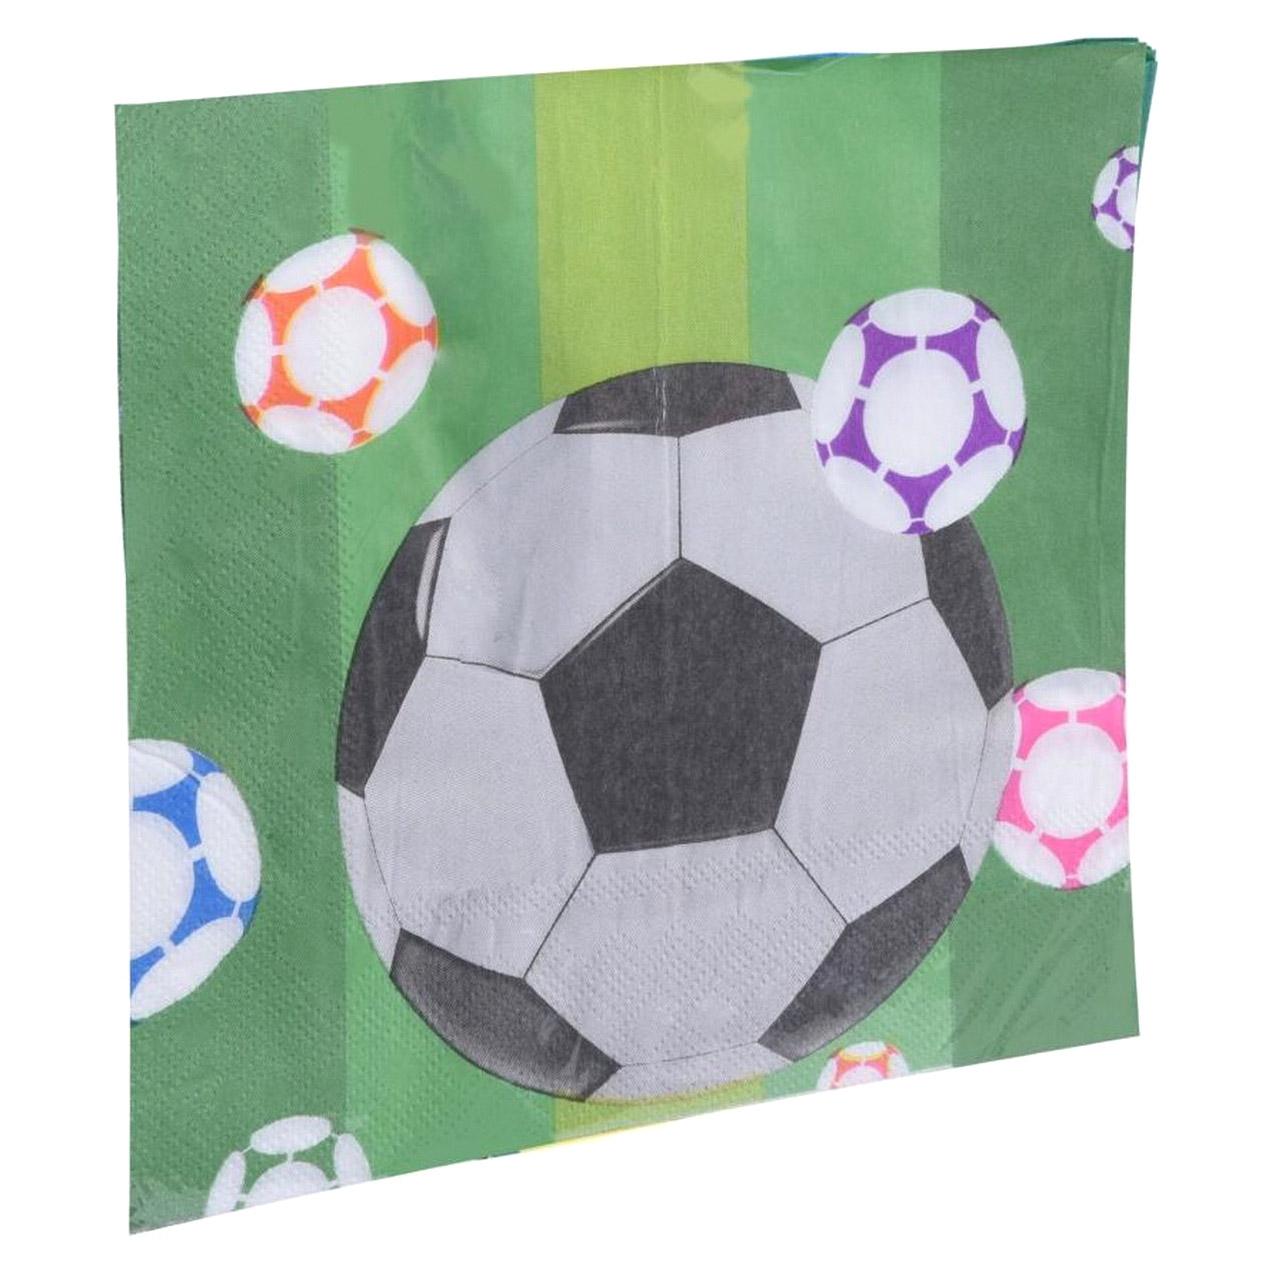 Салфетки Koopman party Футбол в количестве 16 шт